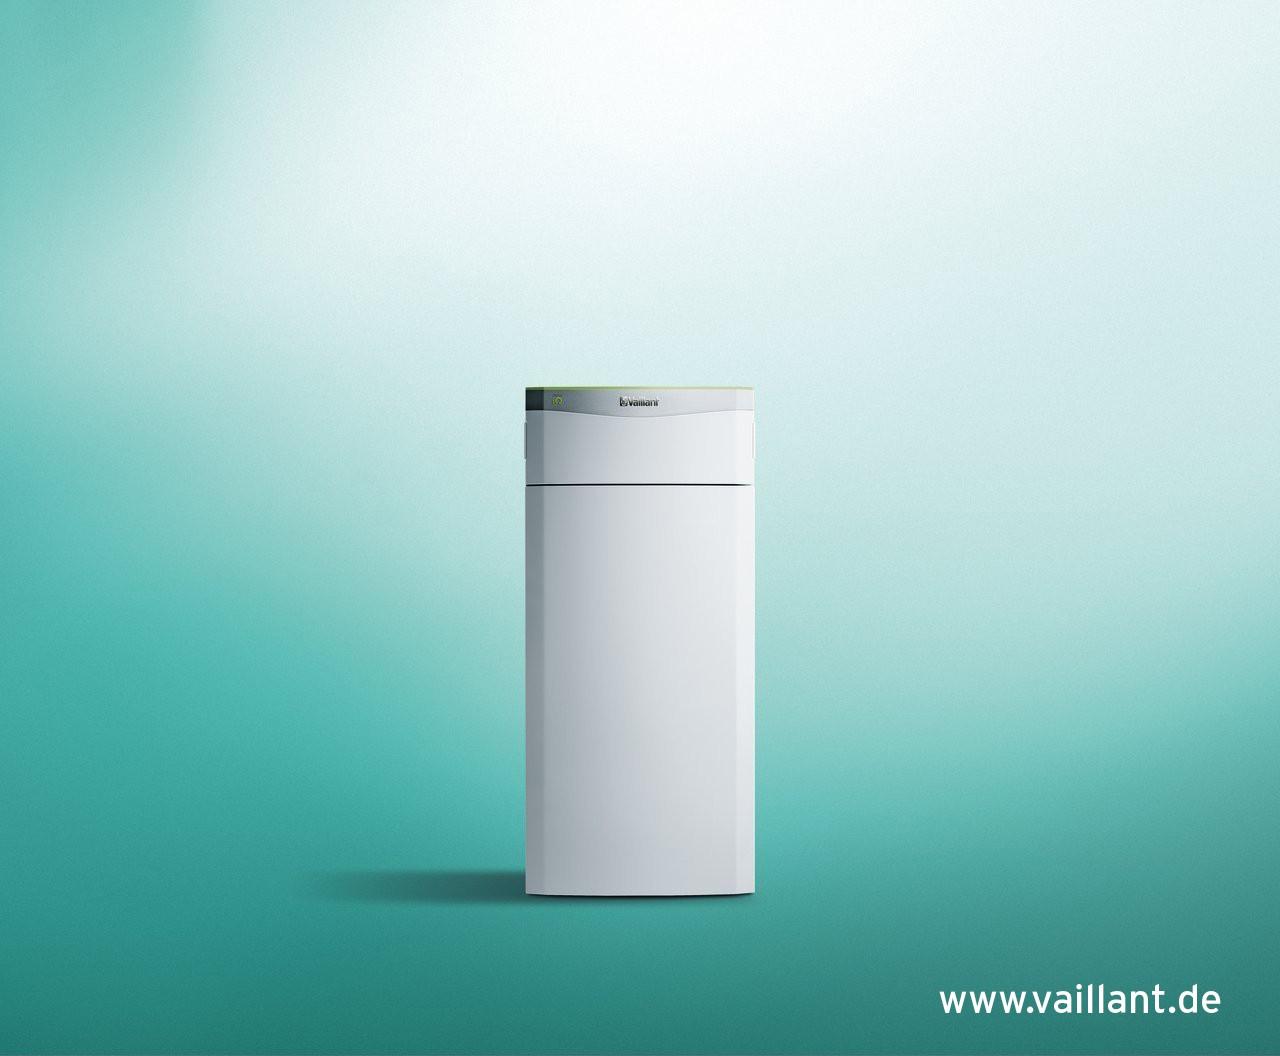 Vaillant VAILLANT Set 4.65 flexoTHERM exclusive VWF 197 /4